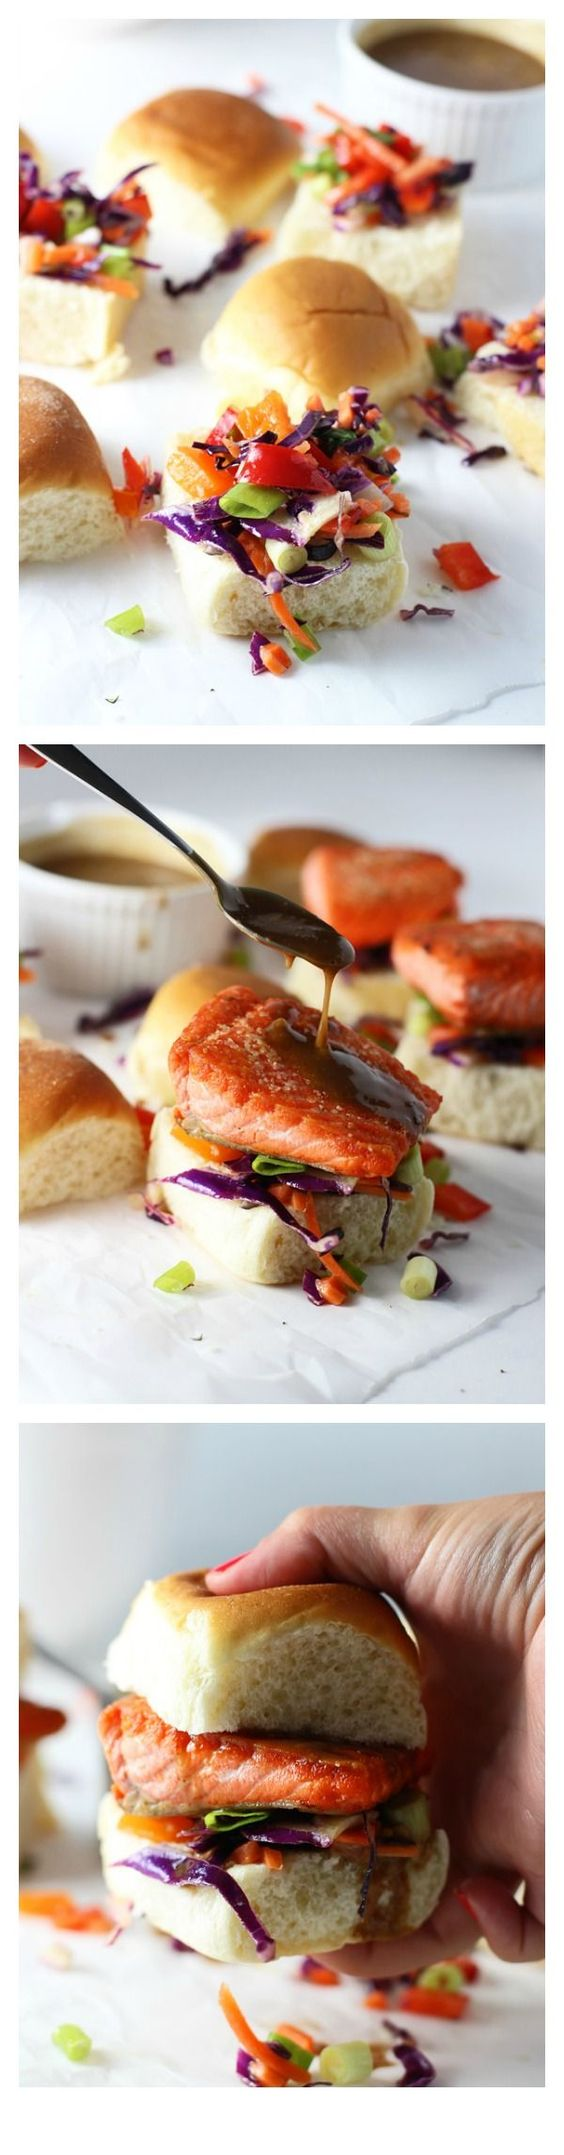 Salmon Sliders with (Epic!) Peanut Sauce and Asian Sesame Slaw via cookingforkeeps.com